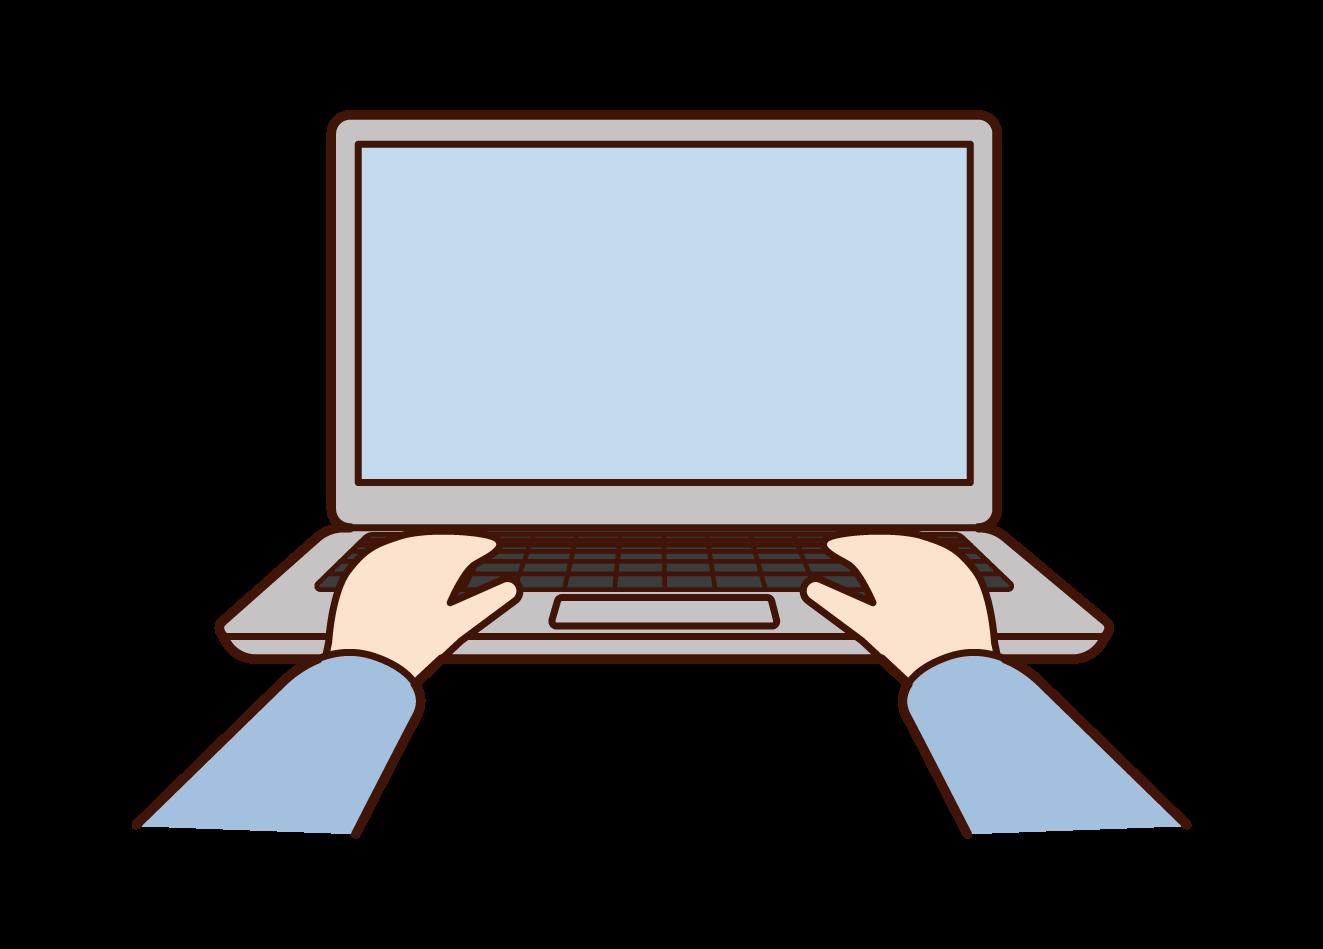 Laptop Illustrations